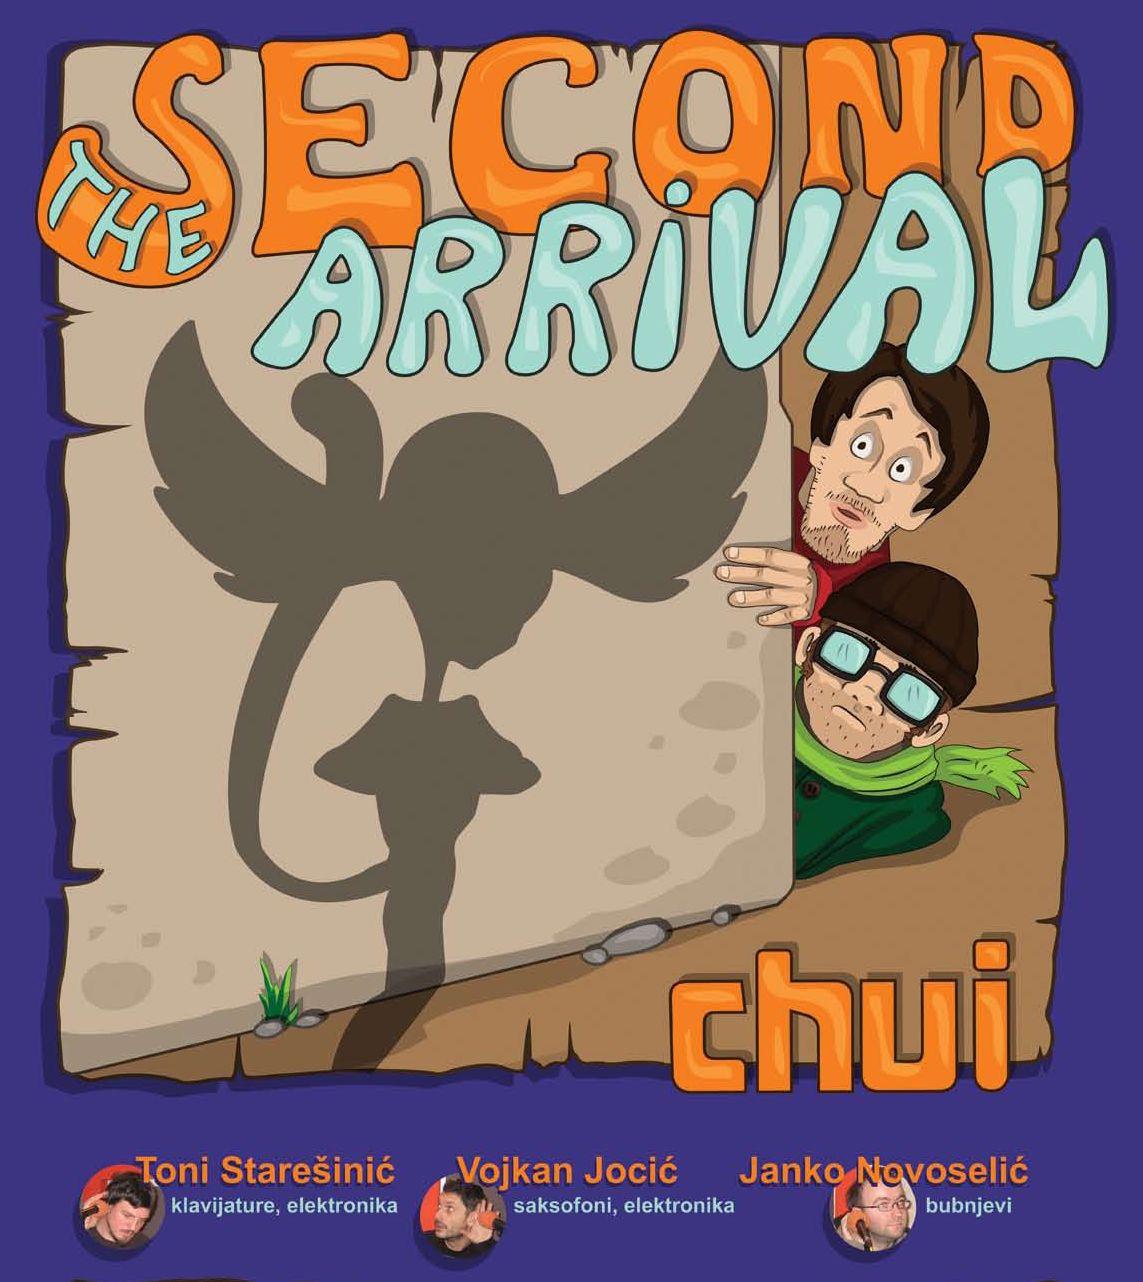 chui_second_arrival_koncert_culture_Shock_festival_klub_kulture